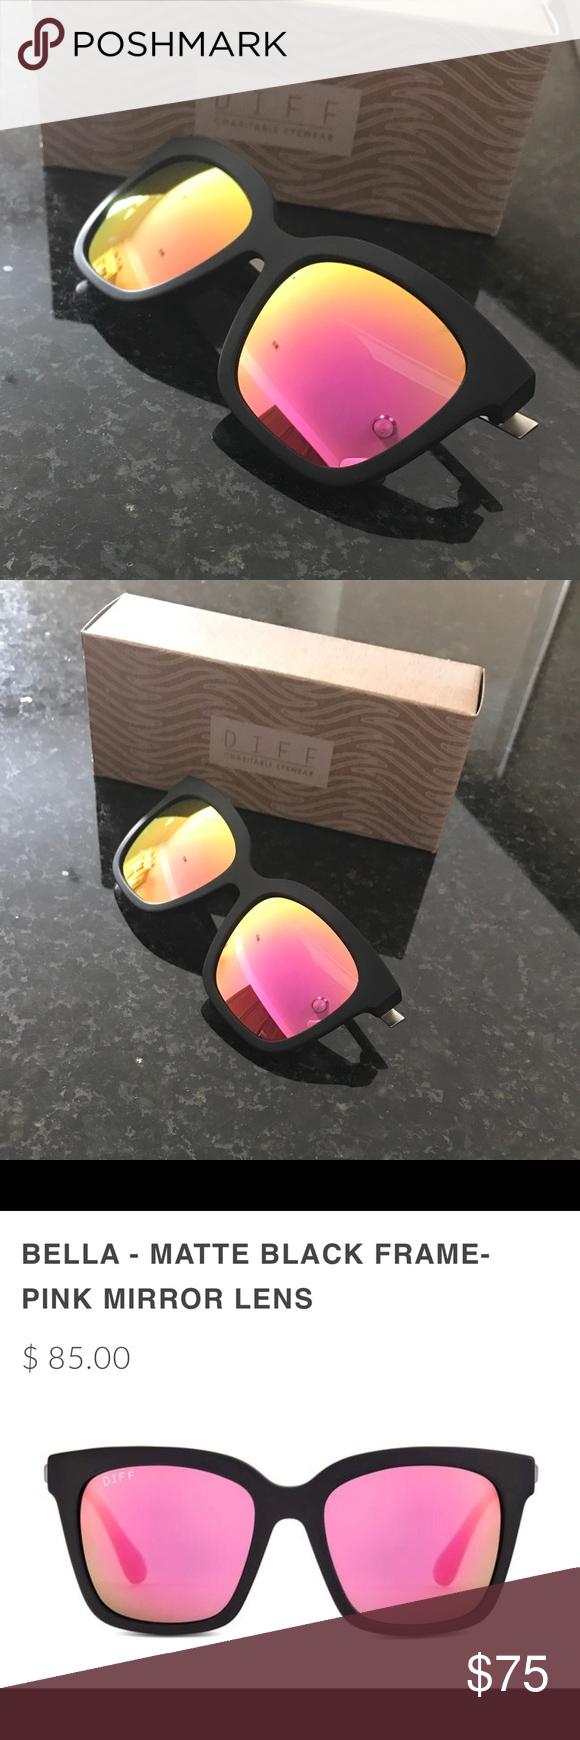 d82f1f42f9c Diff Eyewear Bella Frames w  Pink Mirror Lenses Brand new  never worn! The